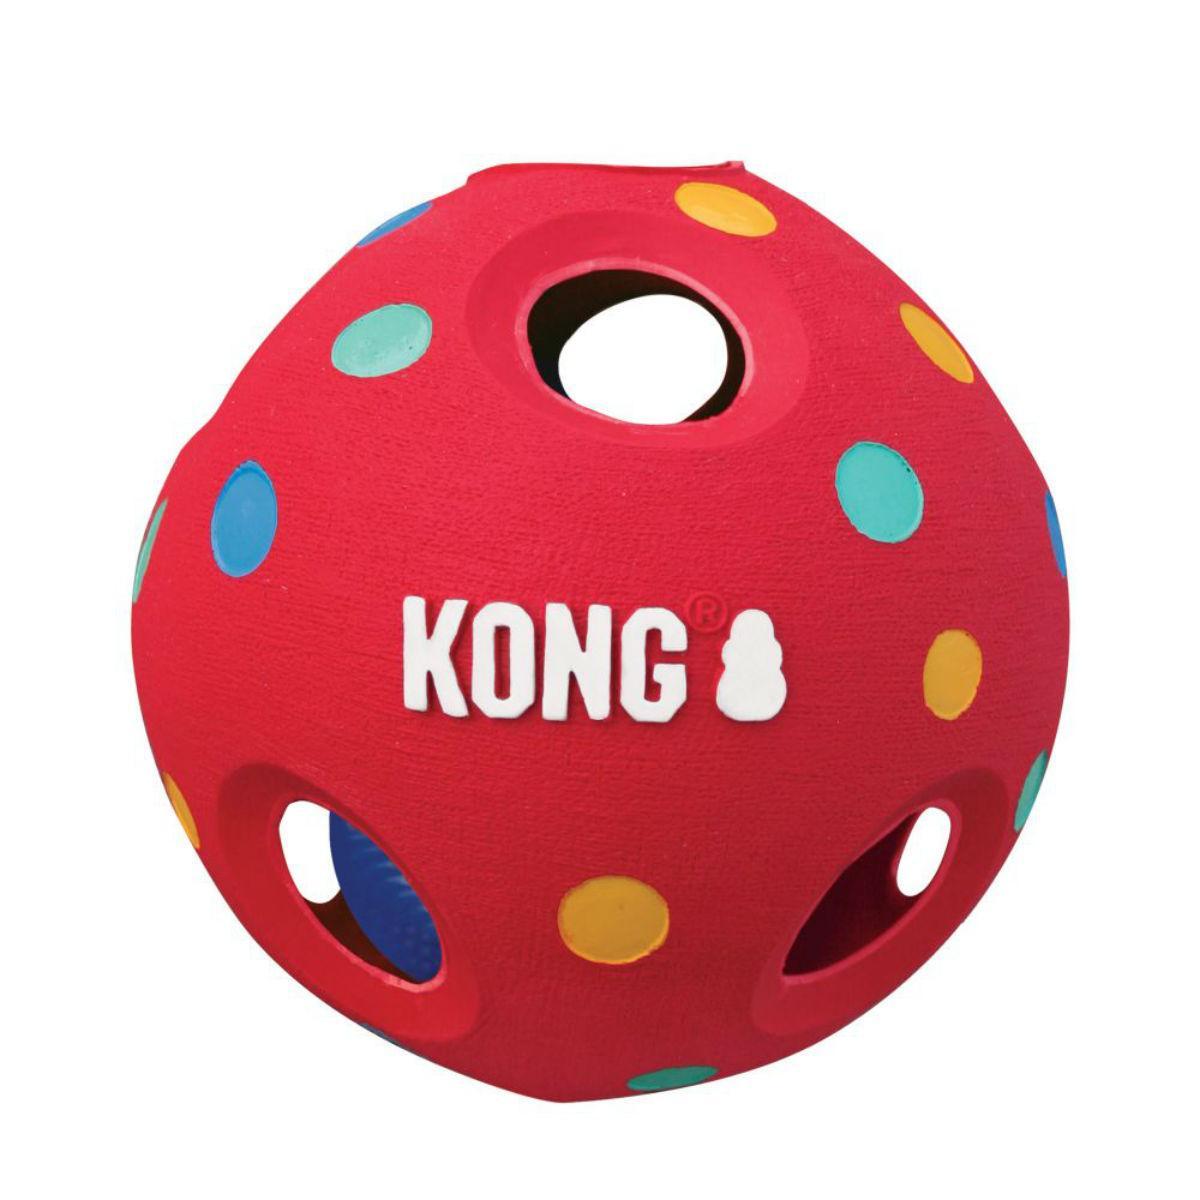 KONG Wiggi Tumble Ball Dog Toy